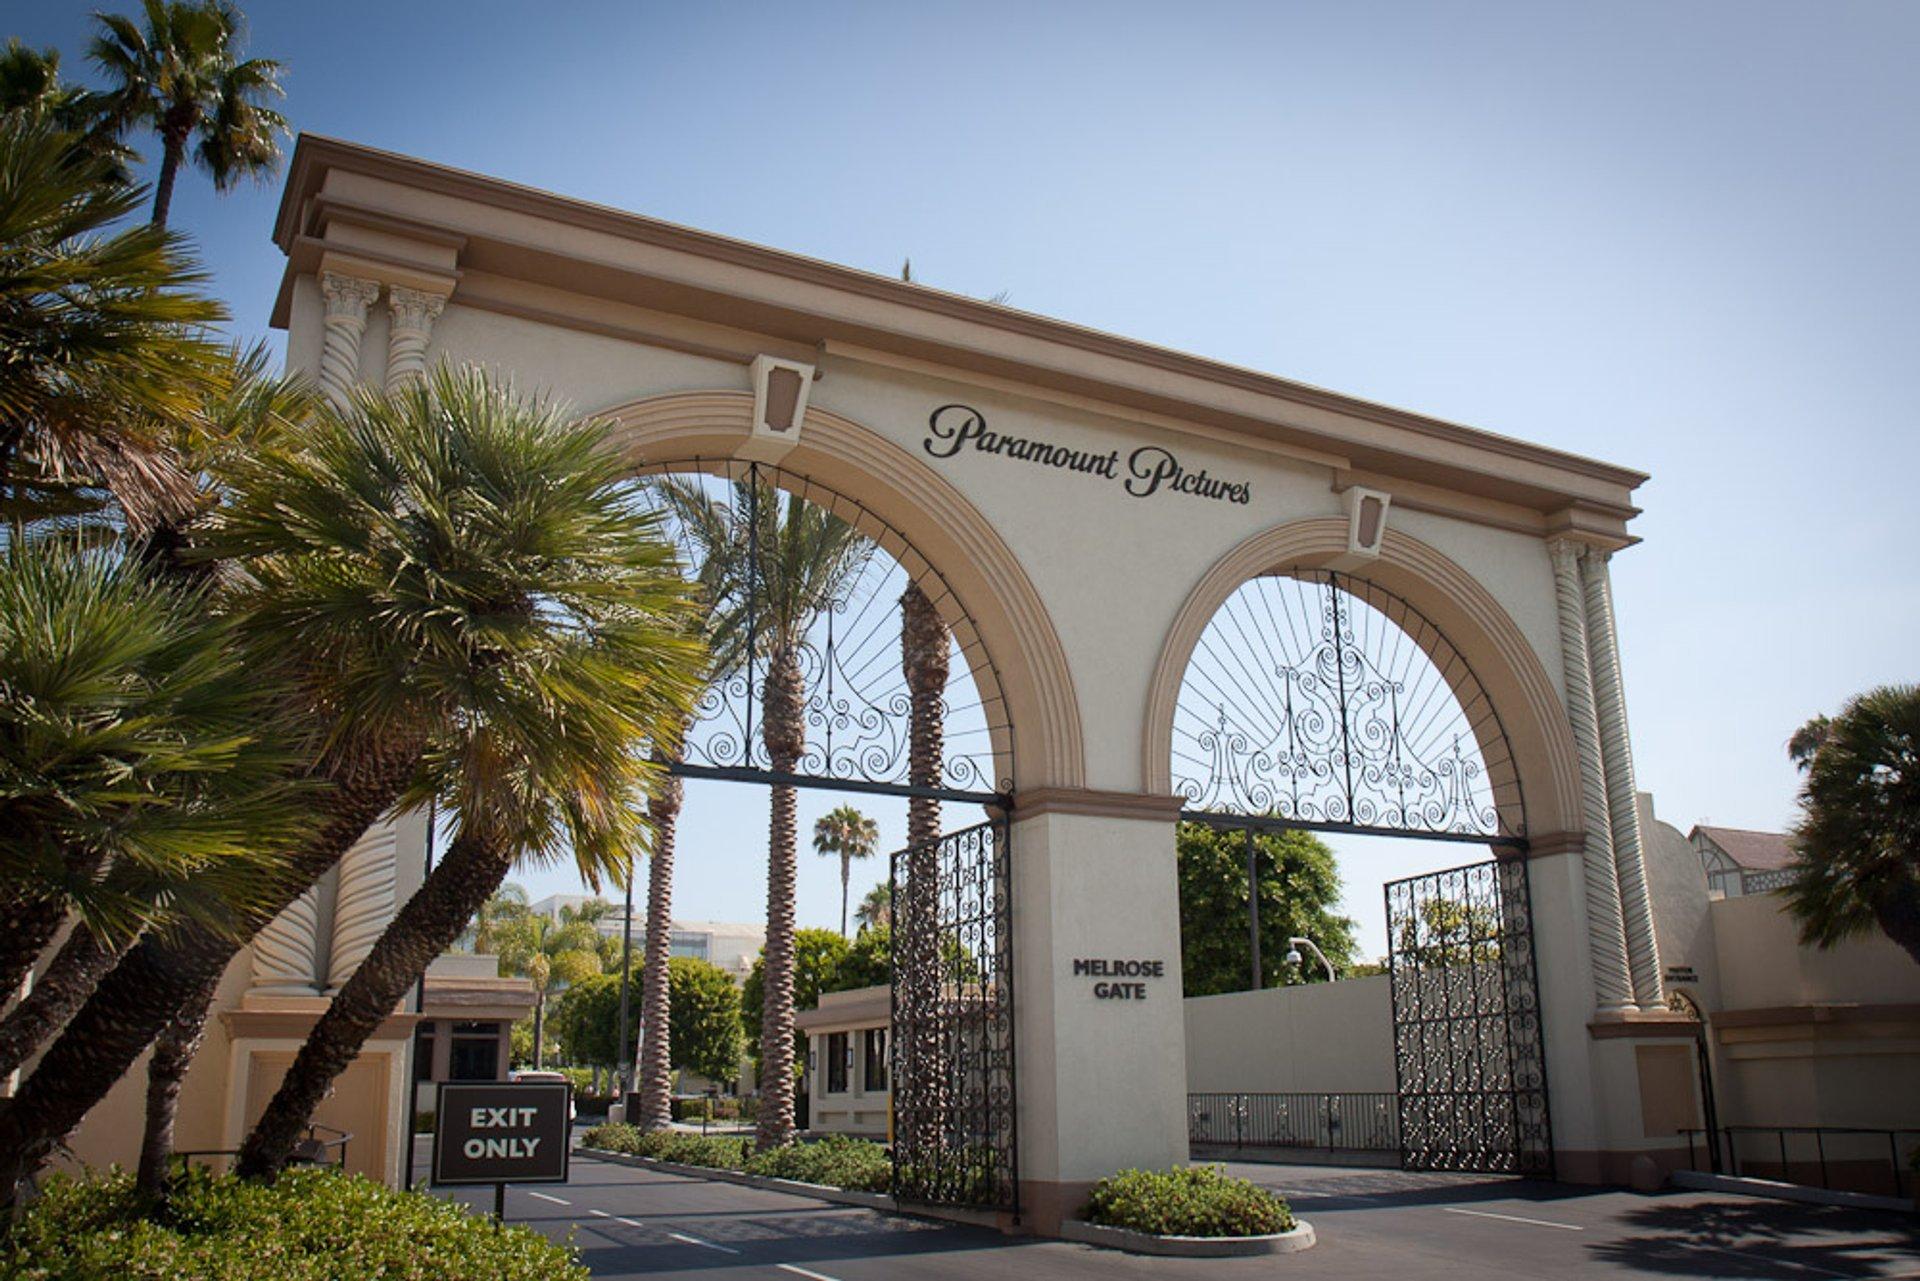 Paramount Studio 2020